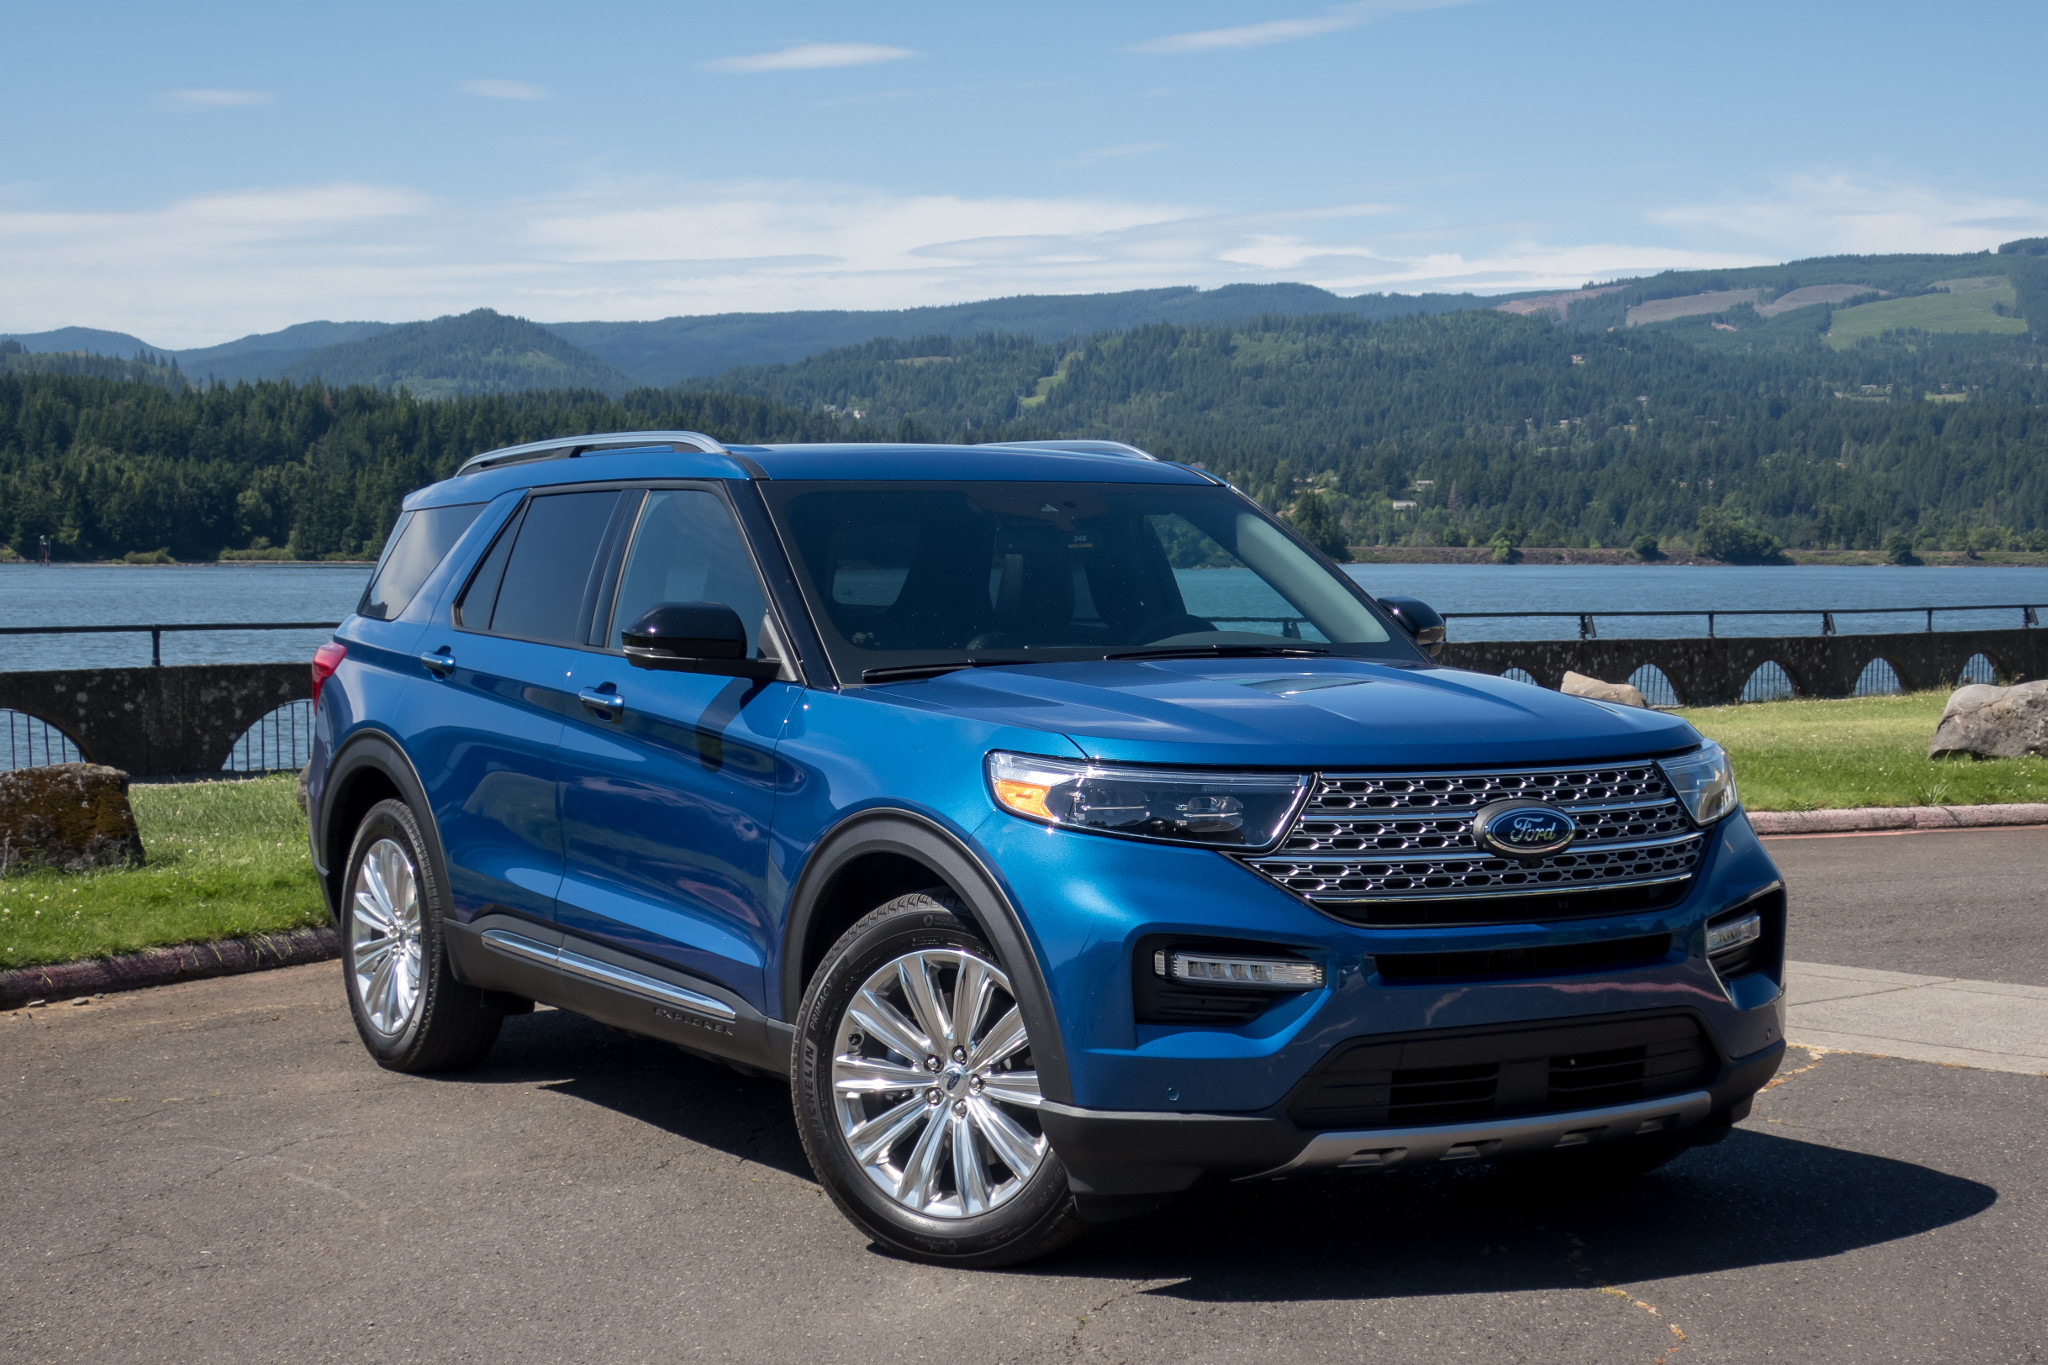 2020-ford-explorer-hybrid-brian-wong-cars-com.jpg